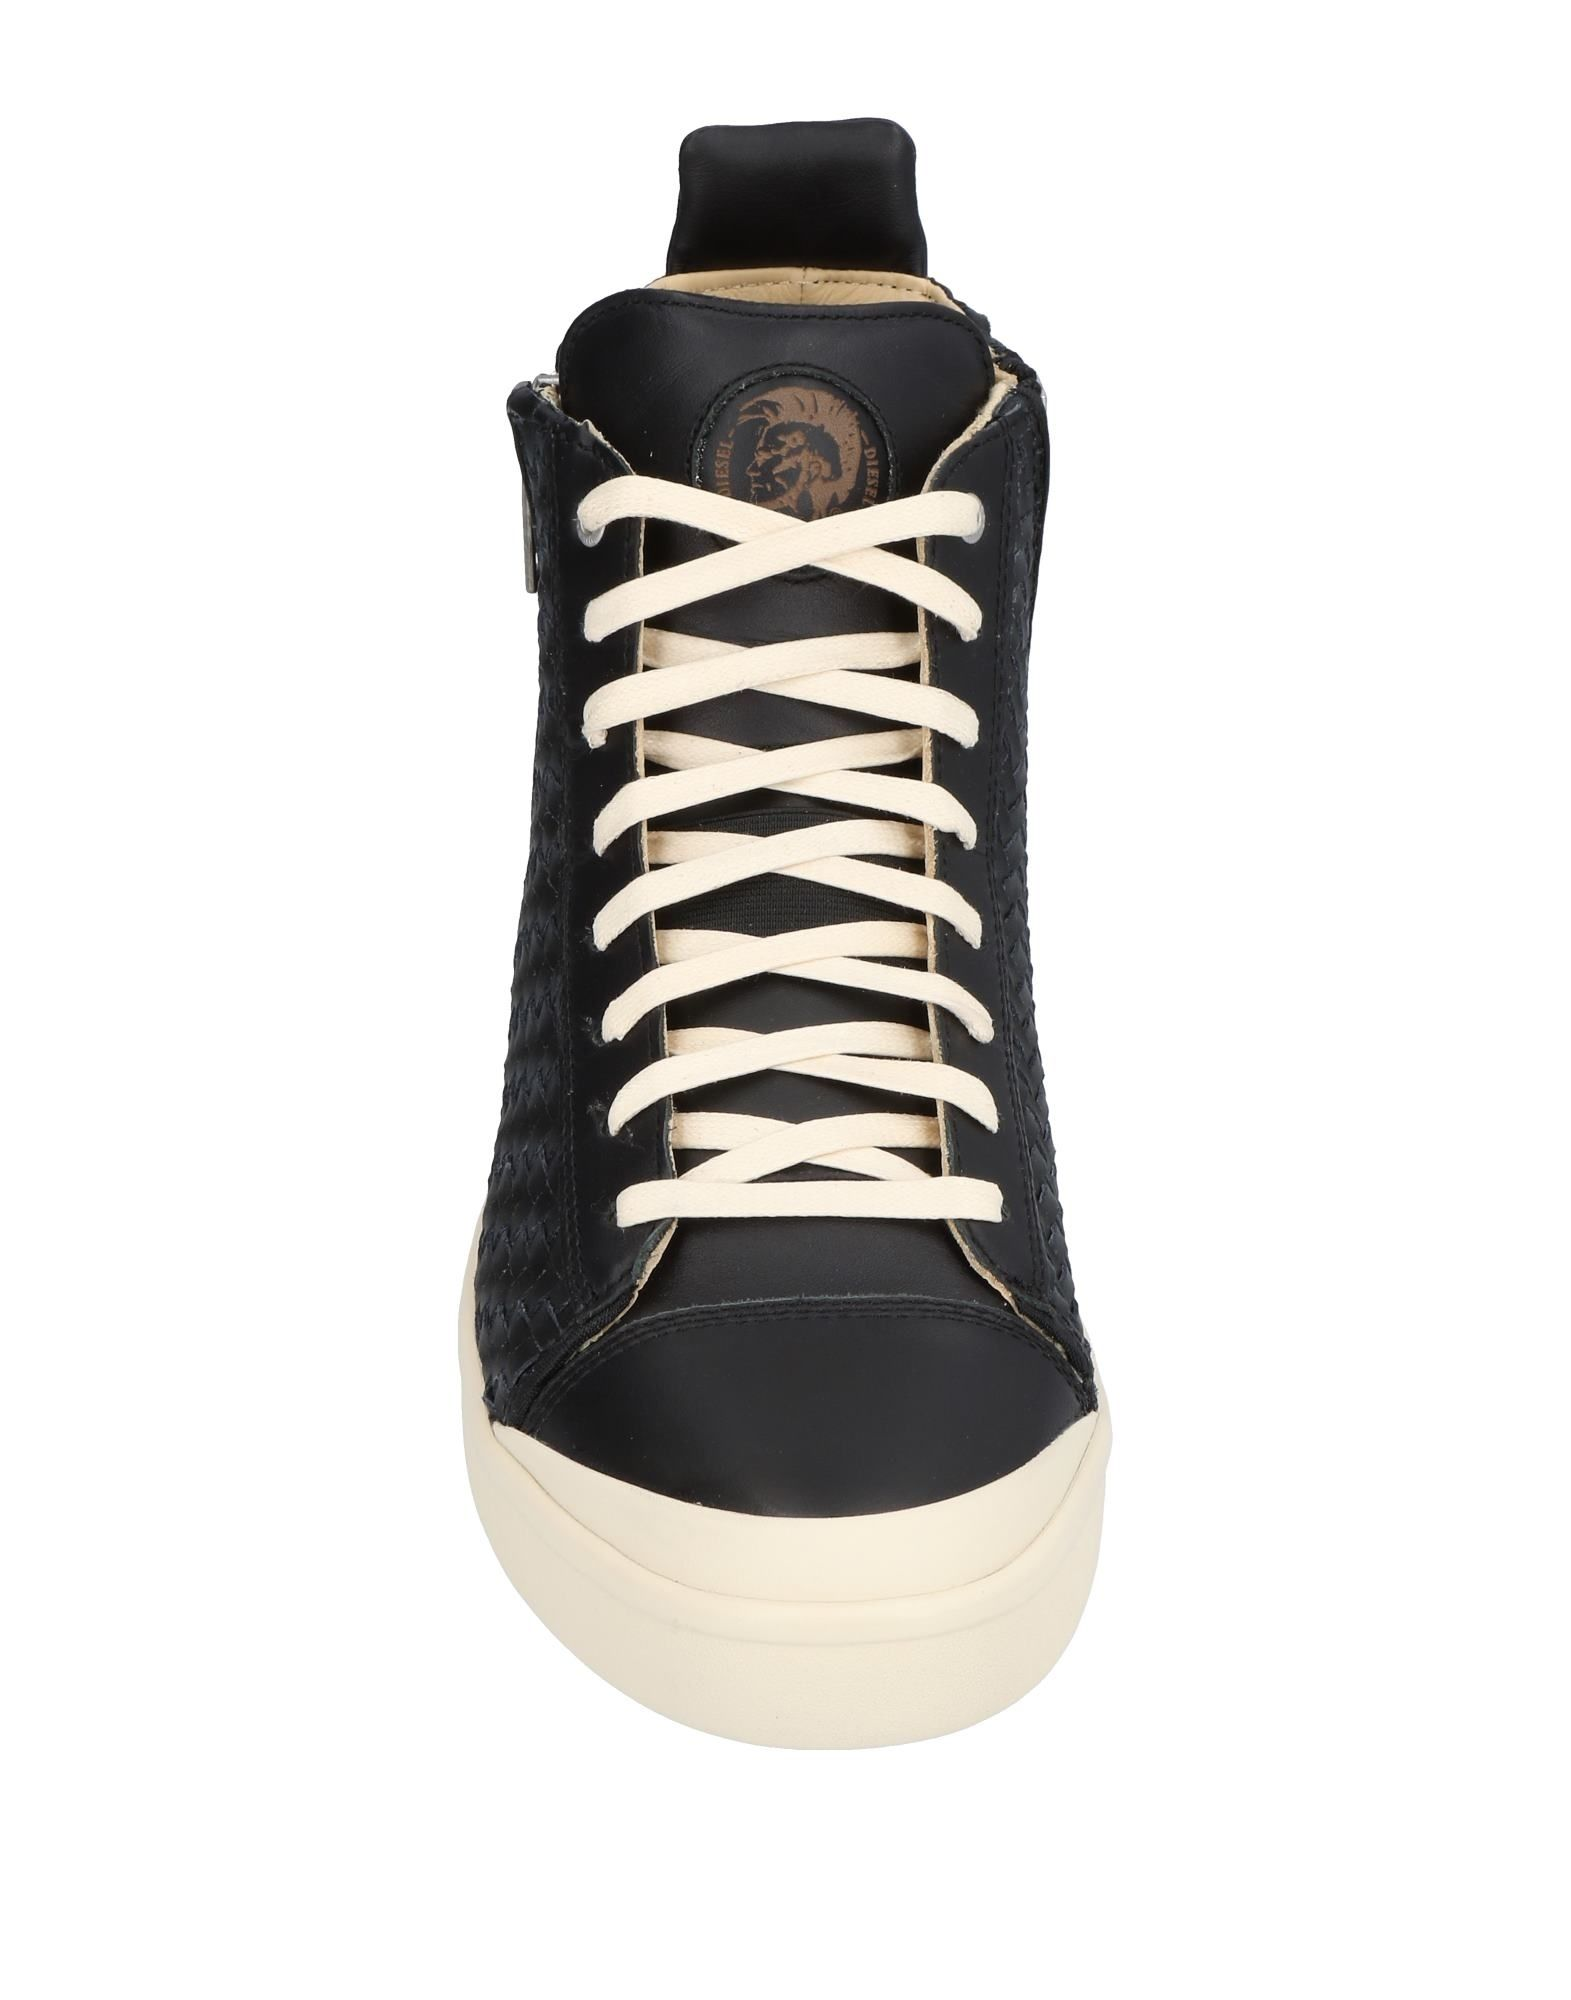 Diesel Sneakers 11420526RW Herren  11420526RW Sneakers Heiße Schuhe f6628e